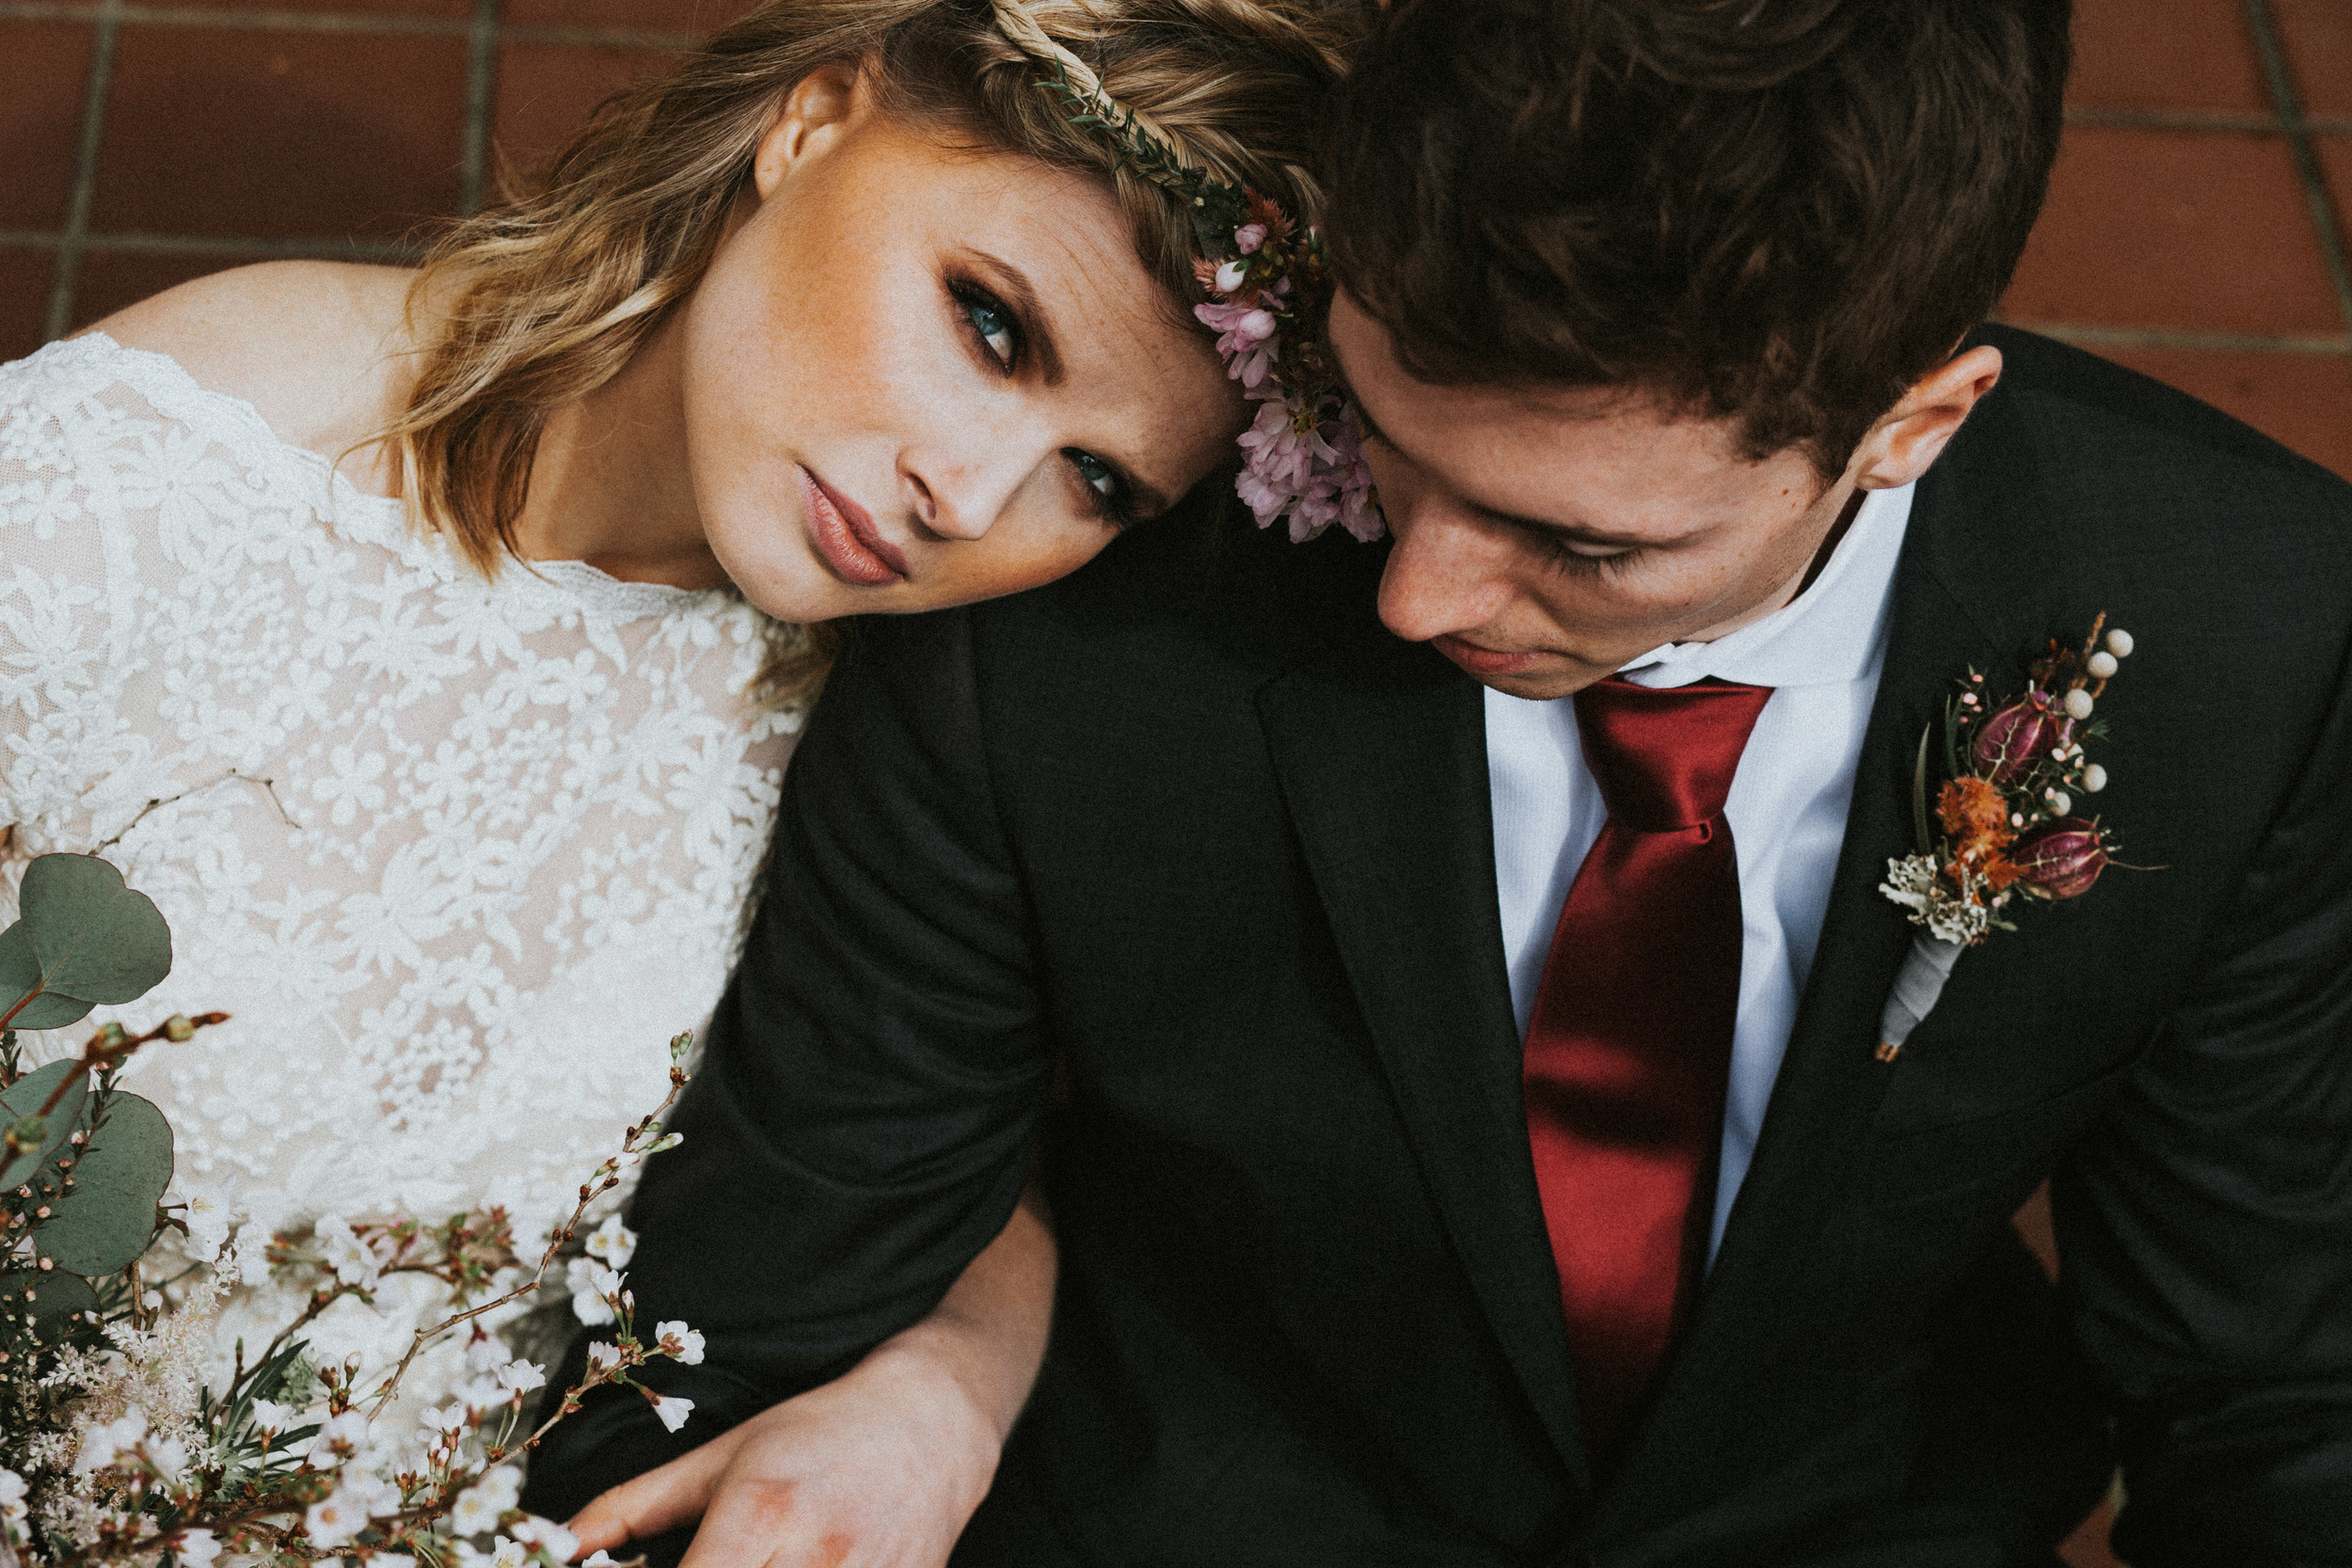 portland-wedding-photographer-7.jpg